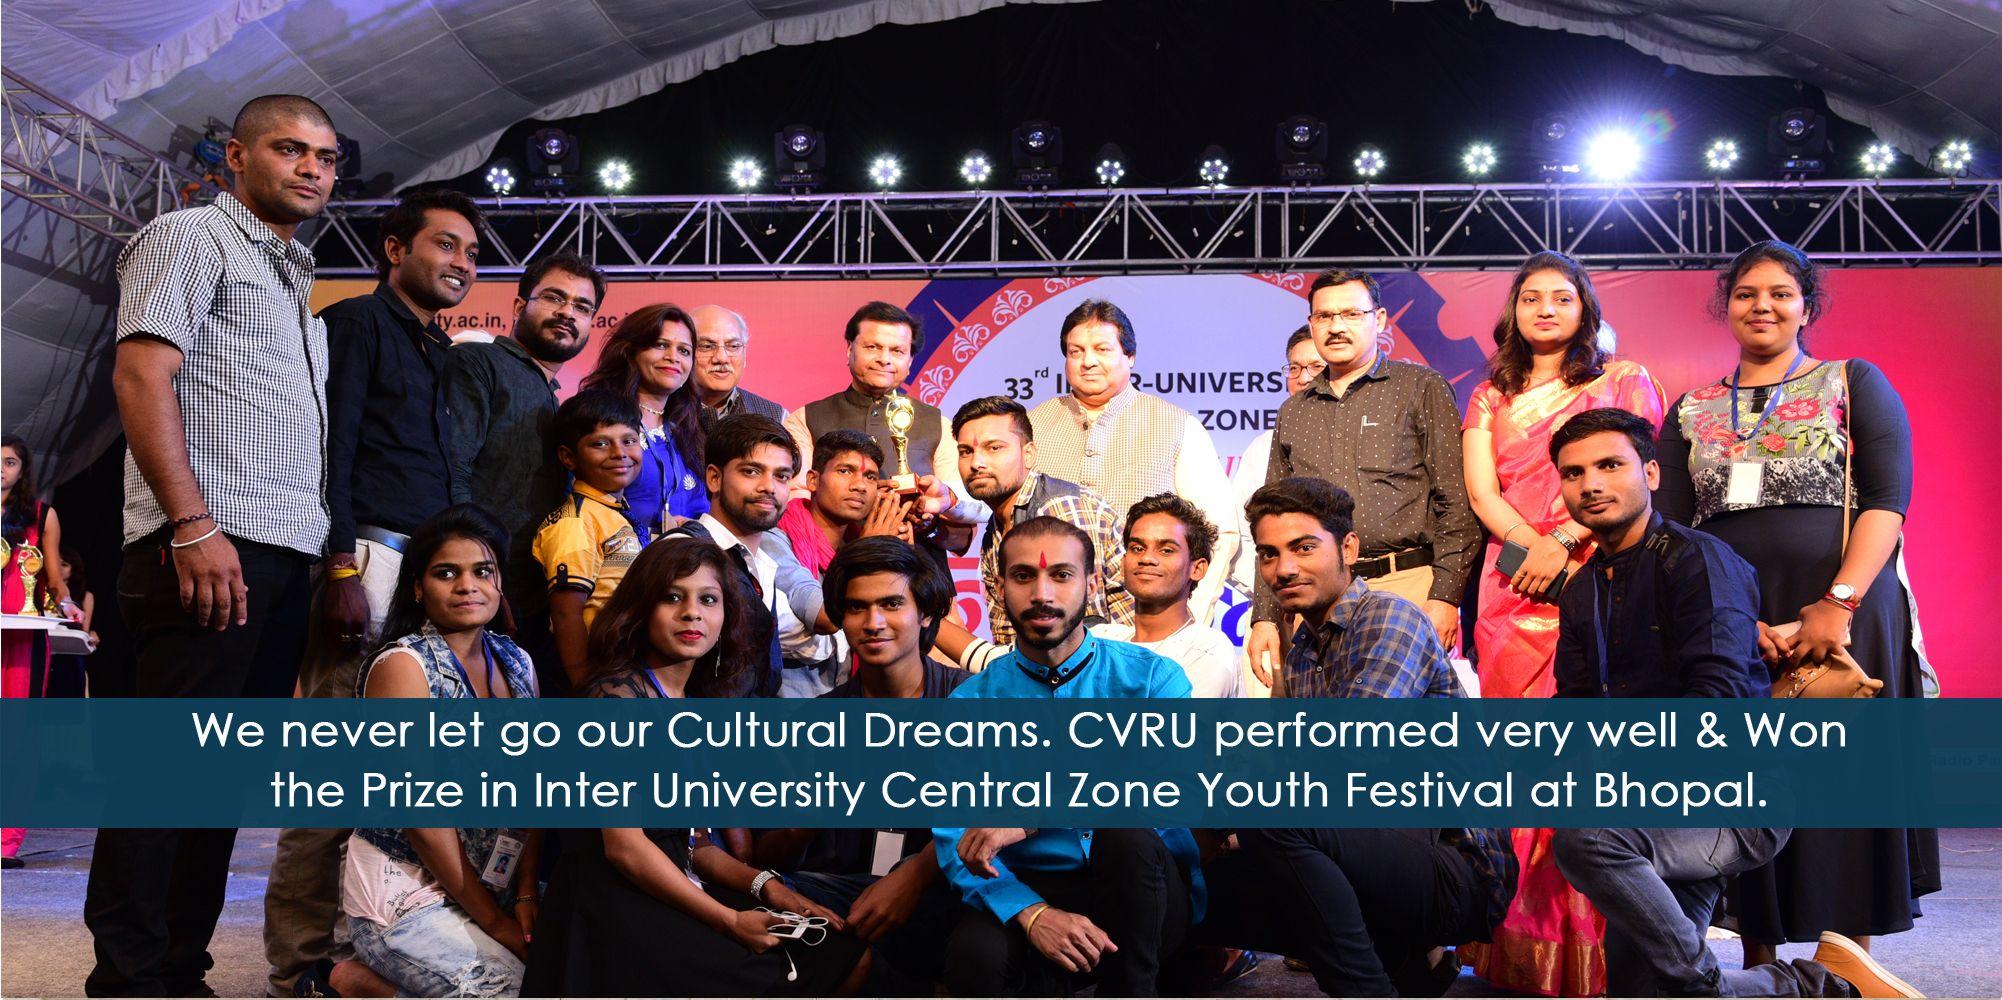 Pin by Sinha Pallavi on CVRU Bilaspur Best university